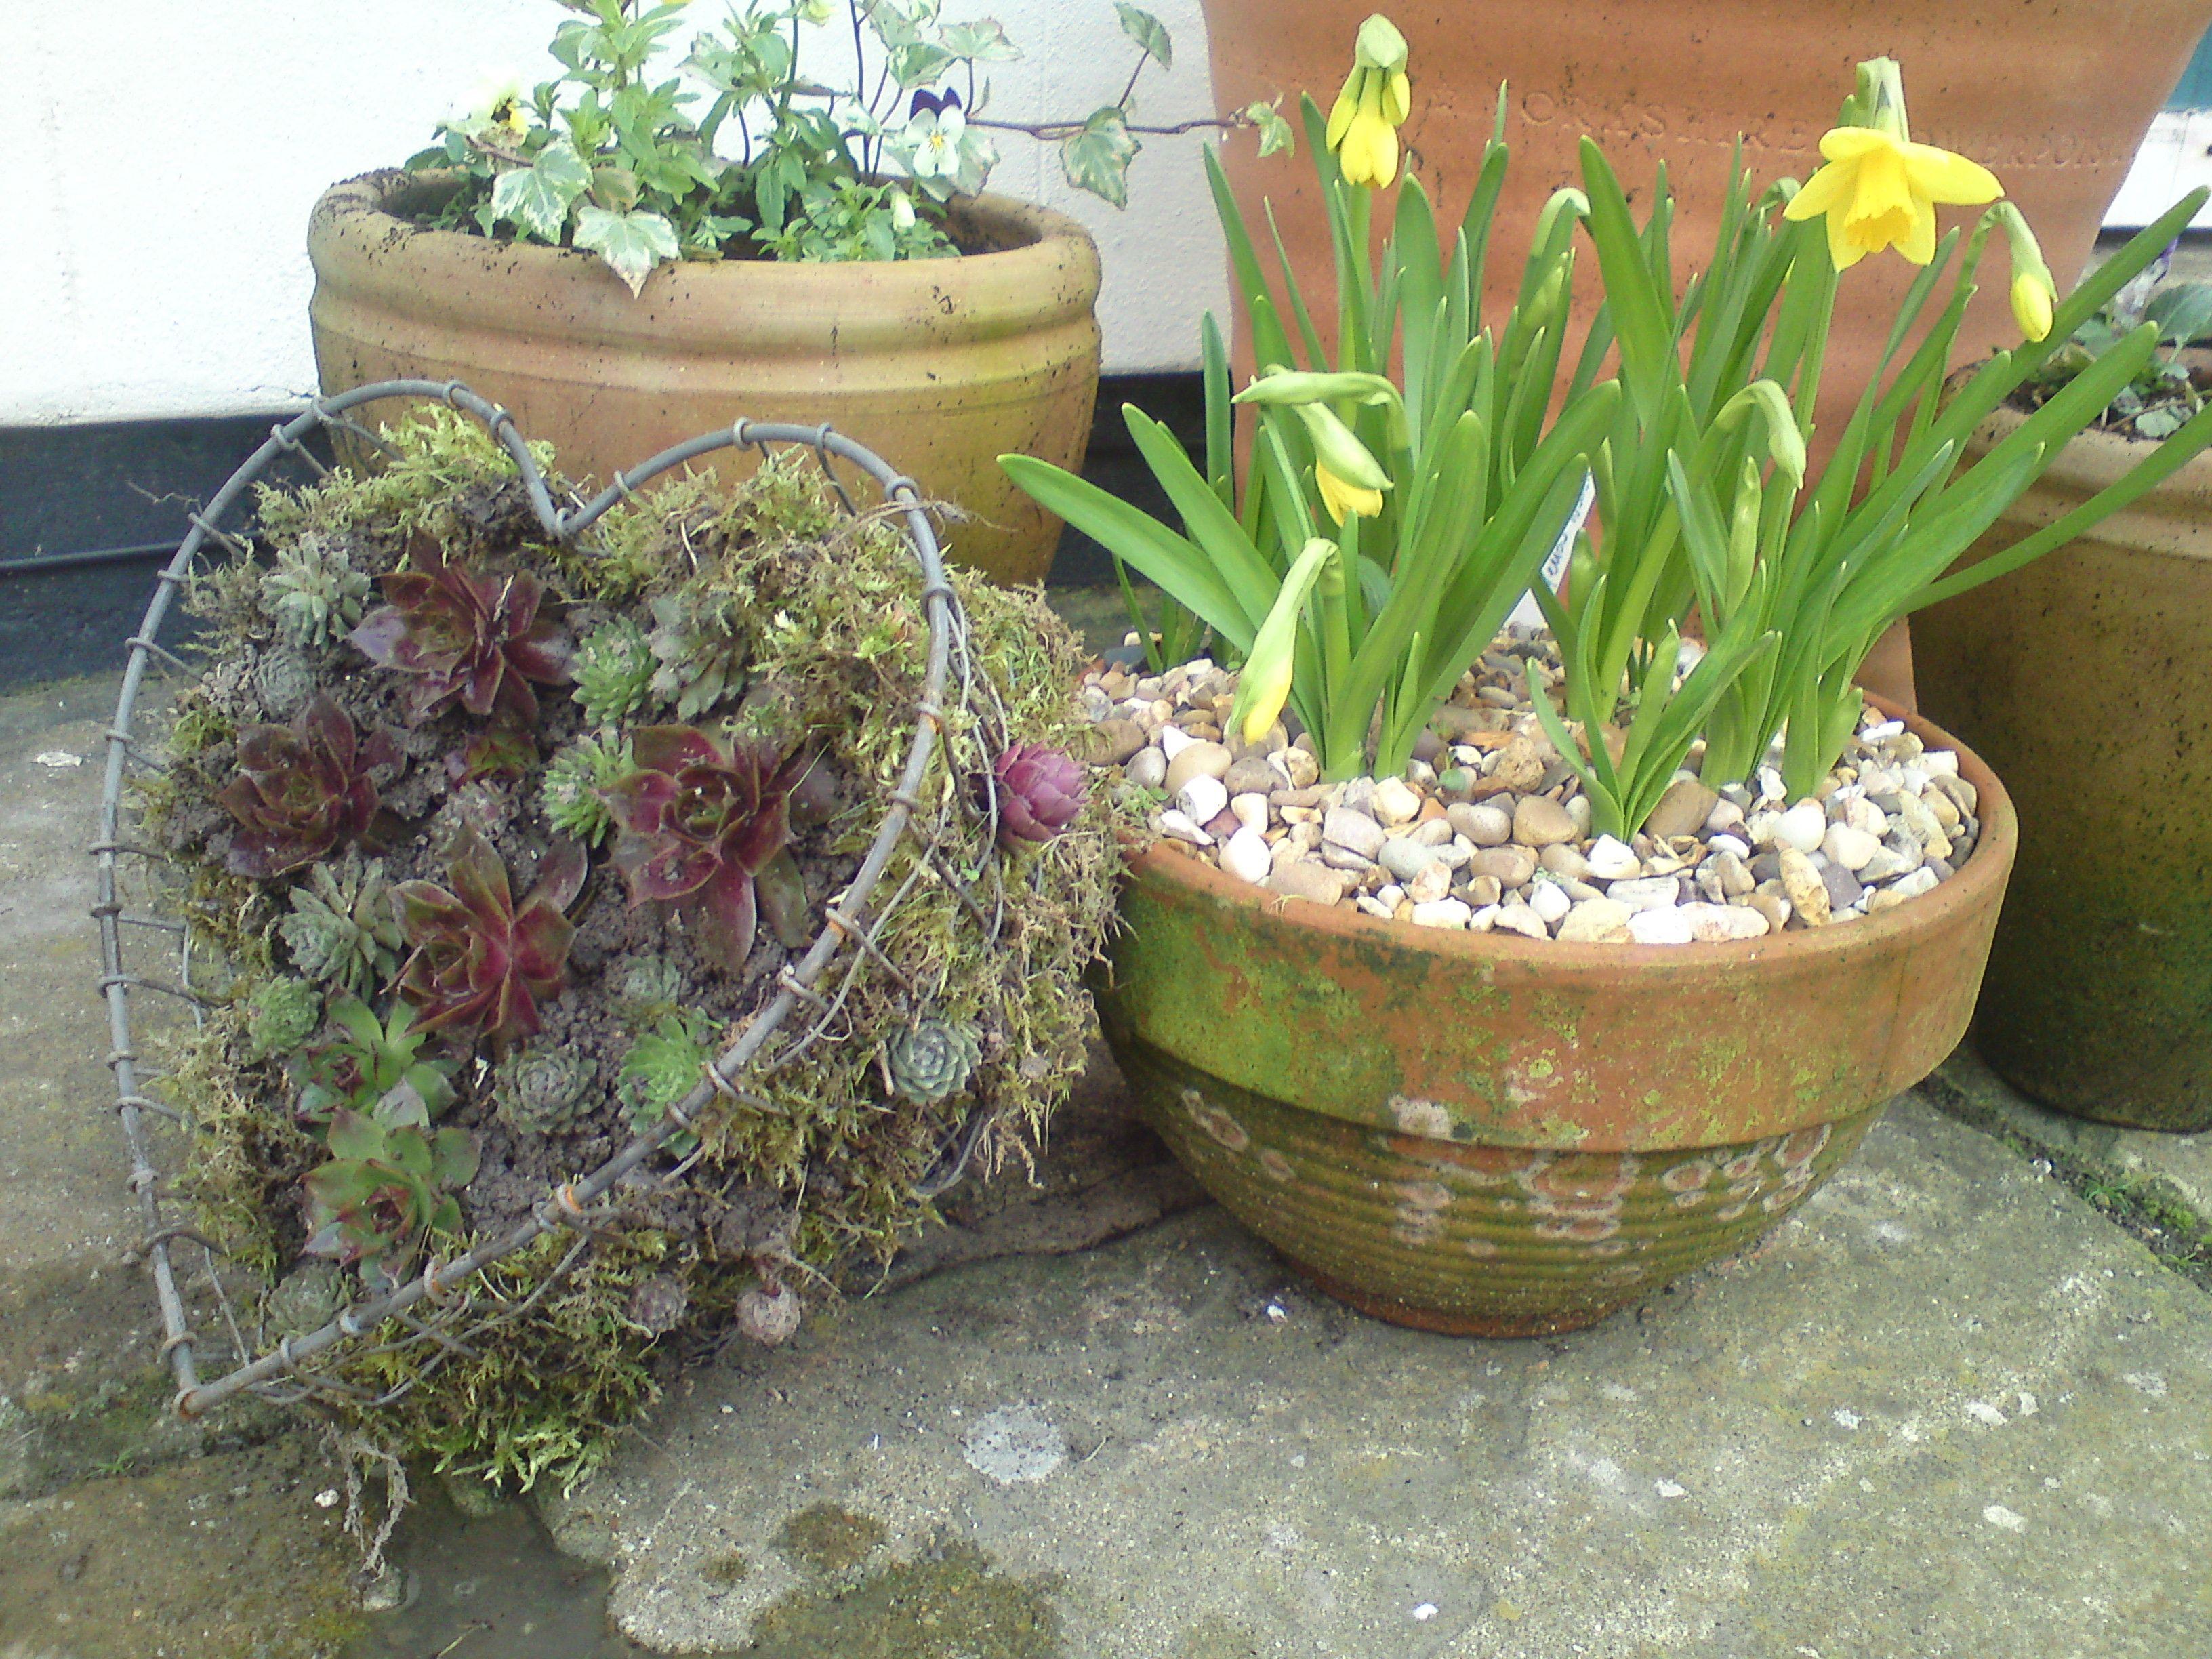 Spring garden ideas on pinterest photograph spring pots for Spring garden ideas